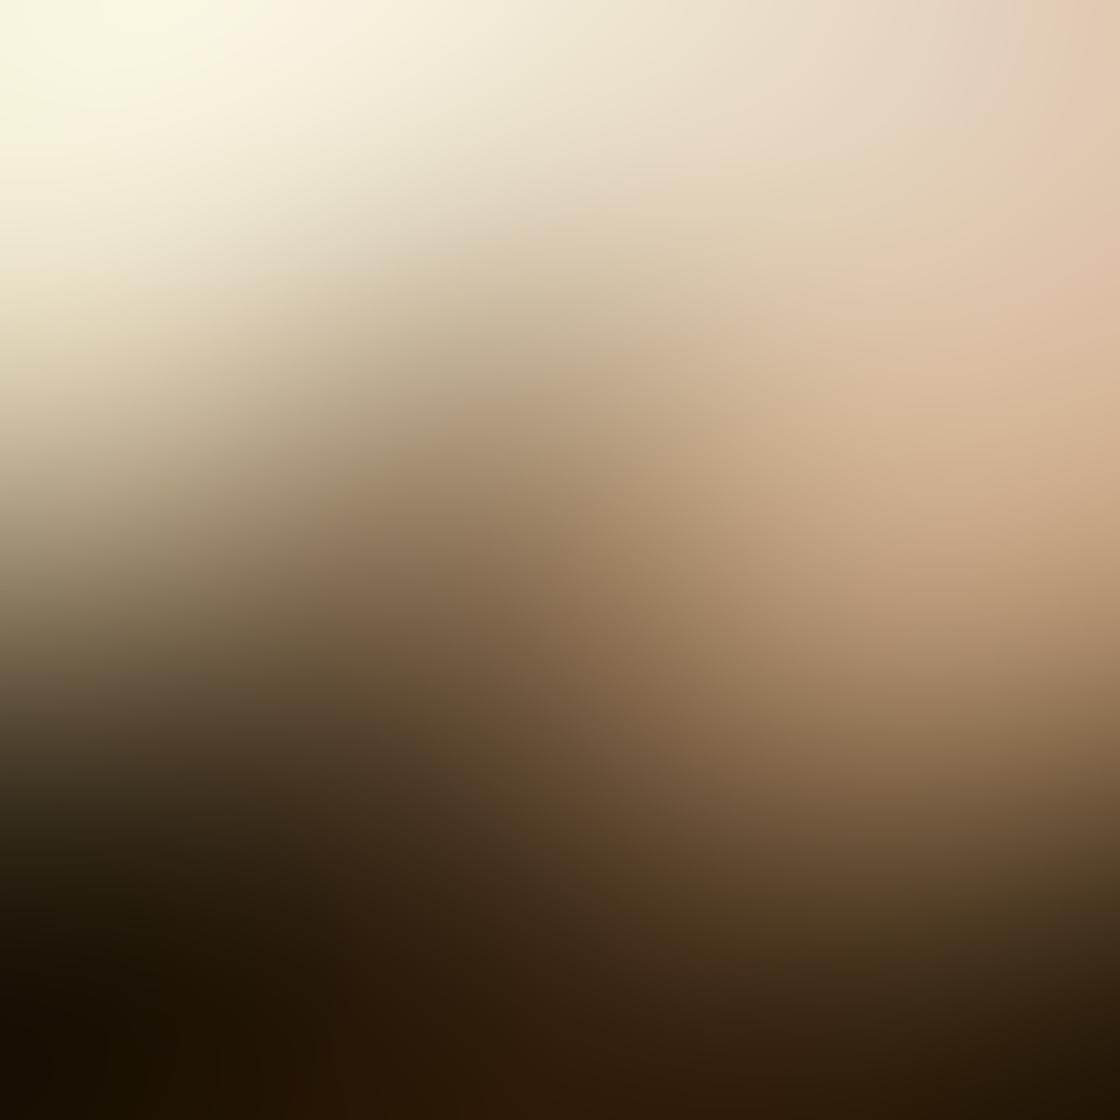 Elements Of Good iPhone Photo 14